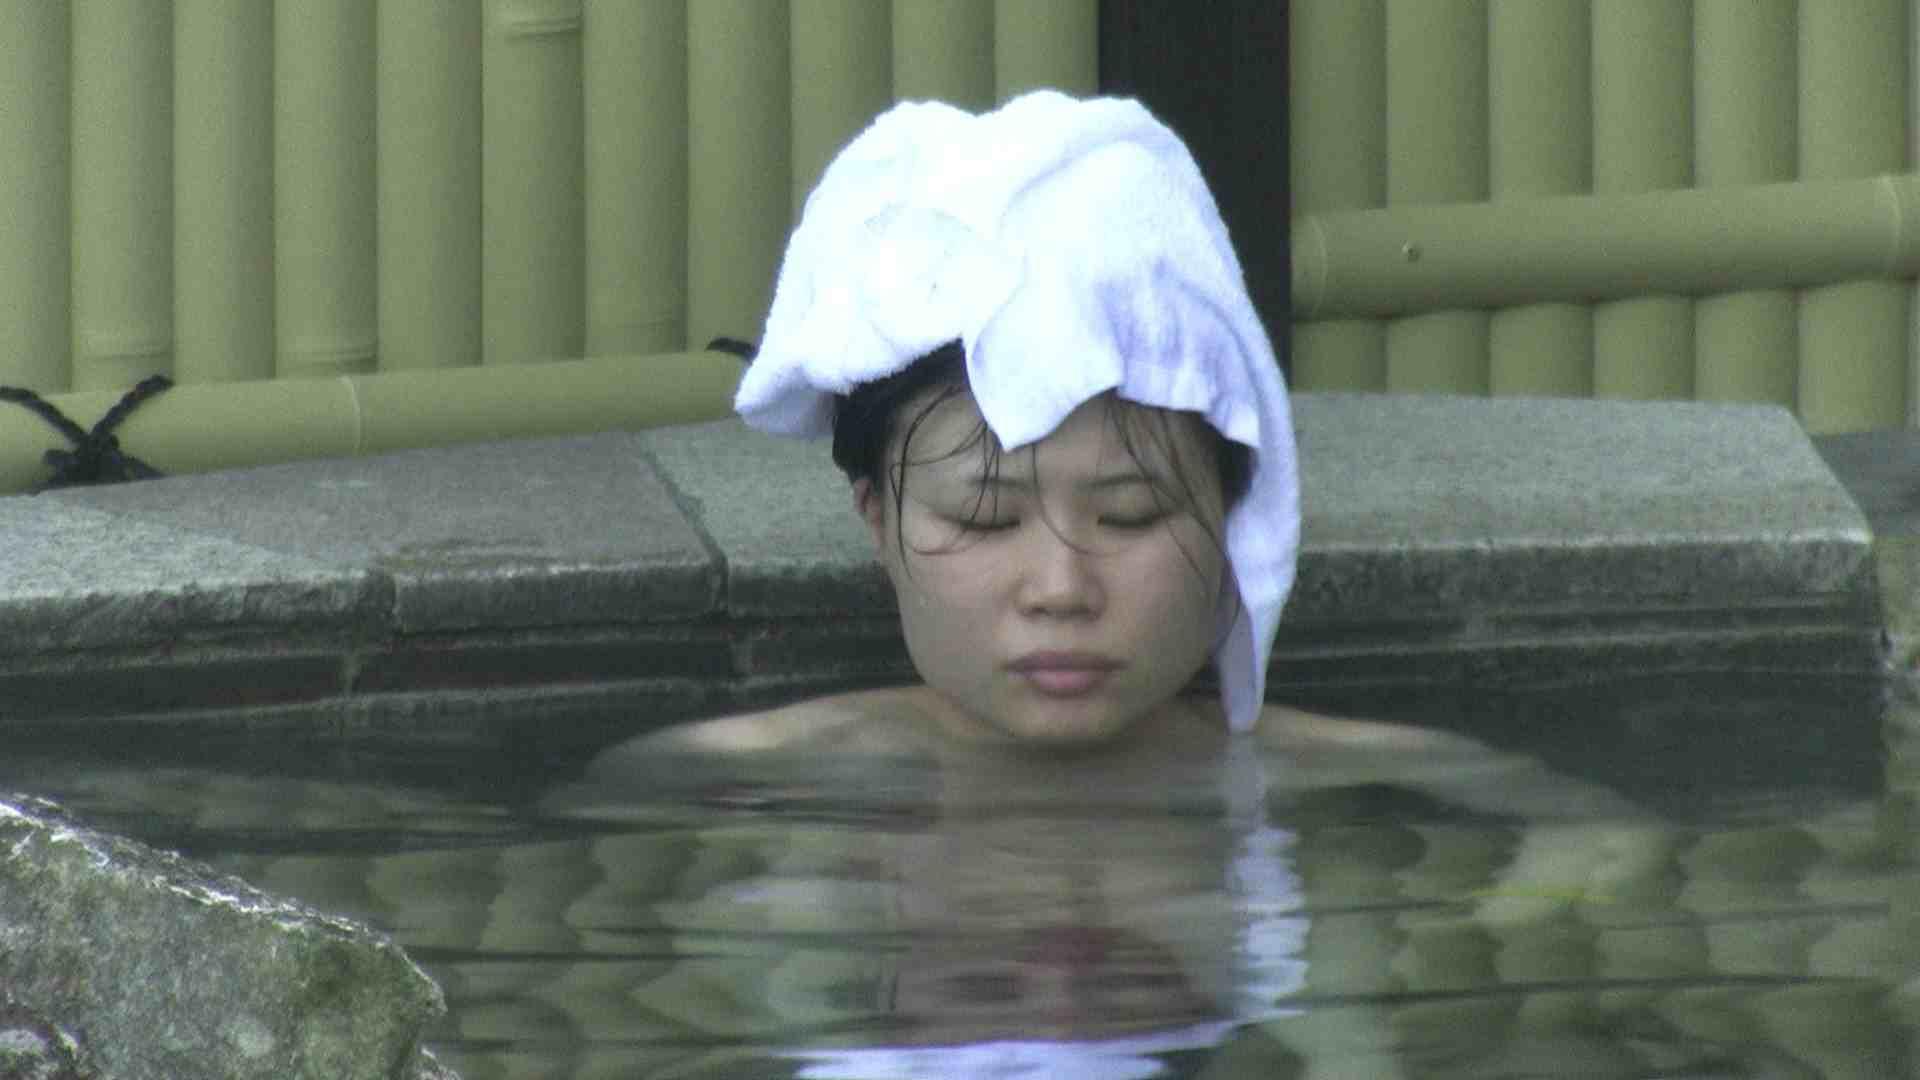 Aquaな露天風呂Vol.183 エッチな盗撮 ワレメ無修正動画無料 106pic 88